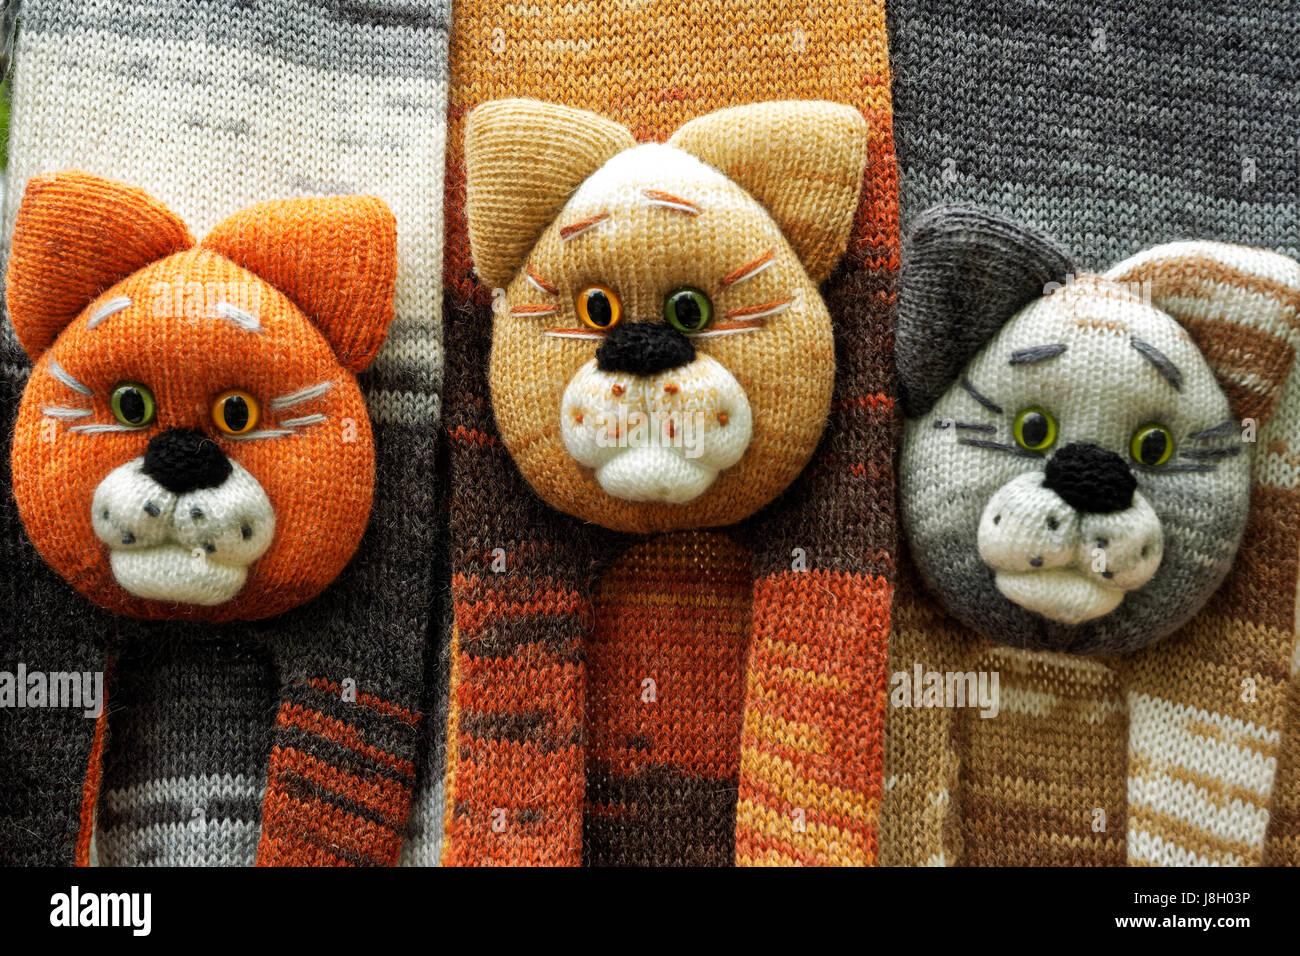 b3ea9296cf1 Woven Wool Shawls Stock Photos & Woven Wool Shawls Stock Images - Alamy